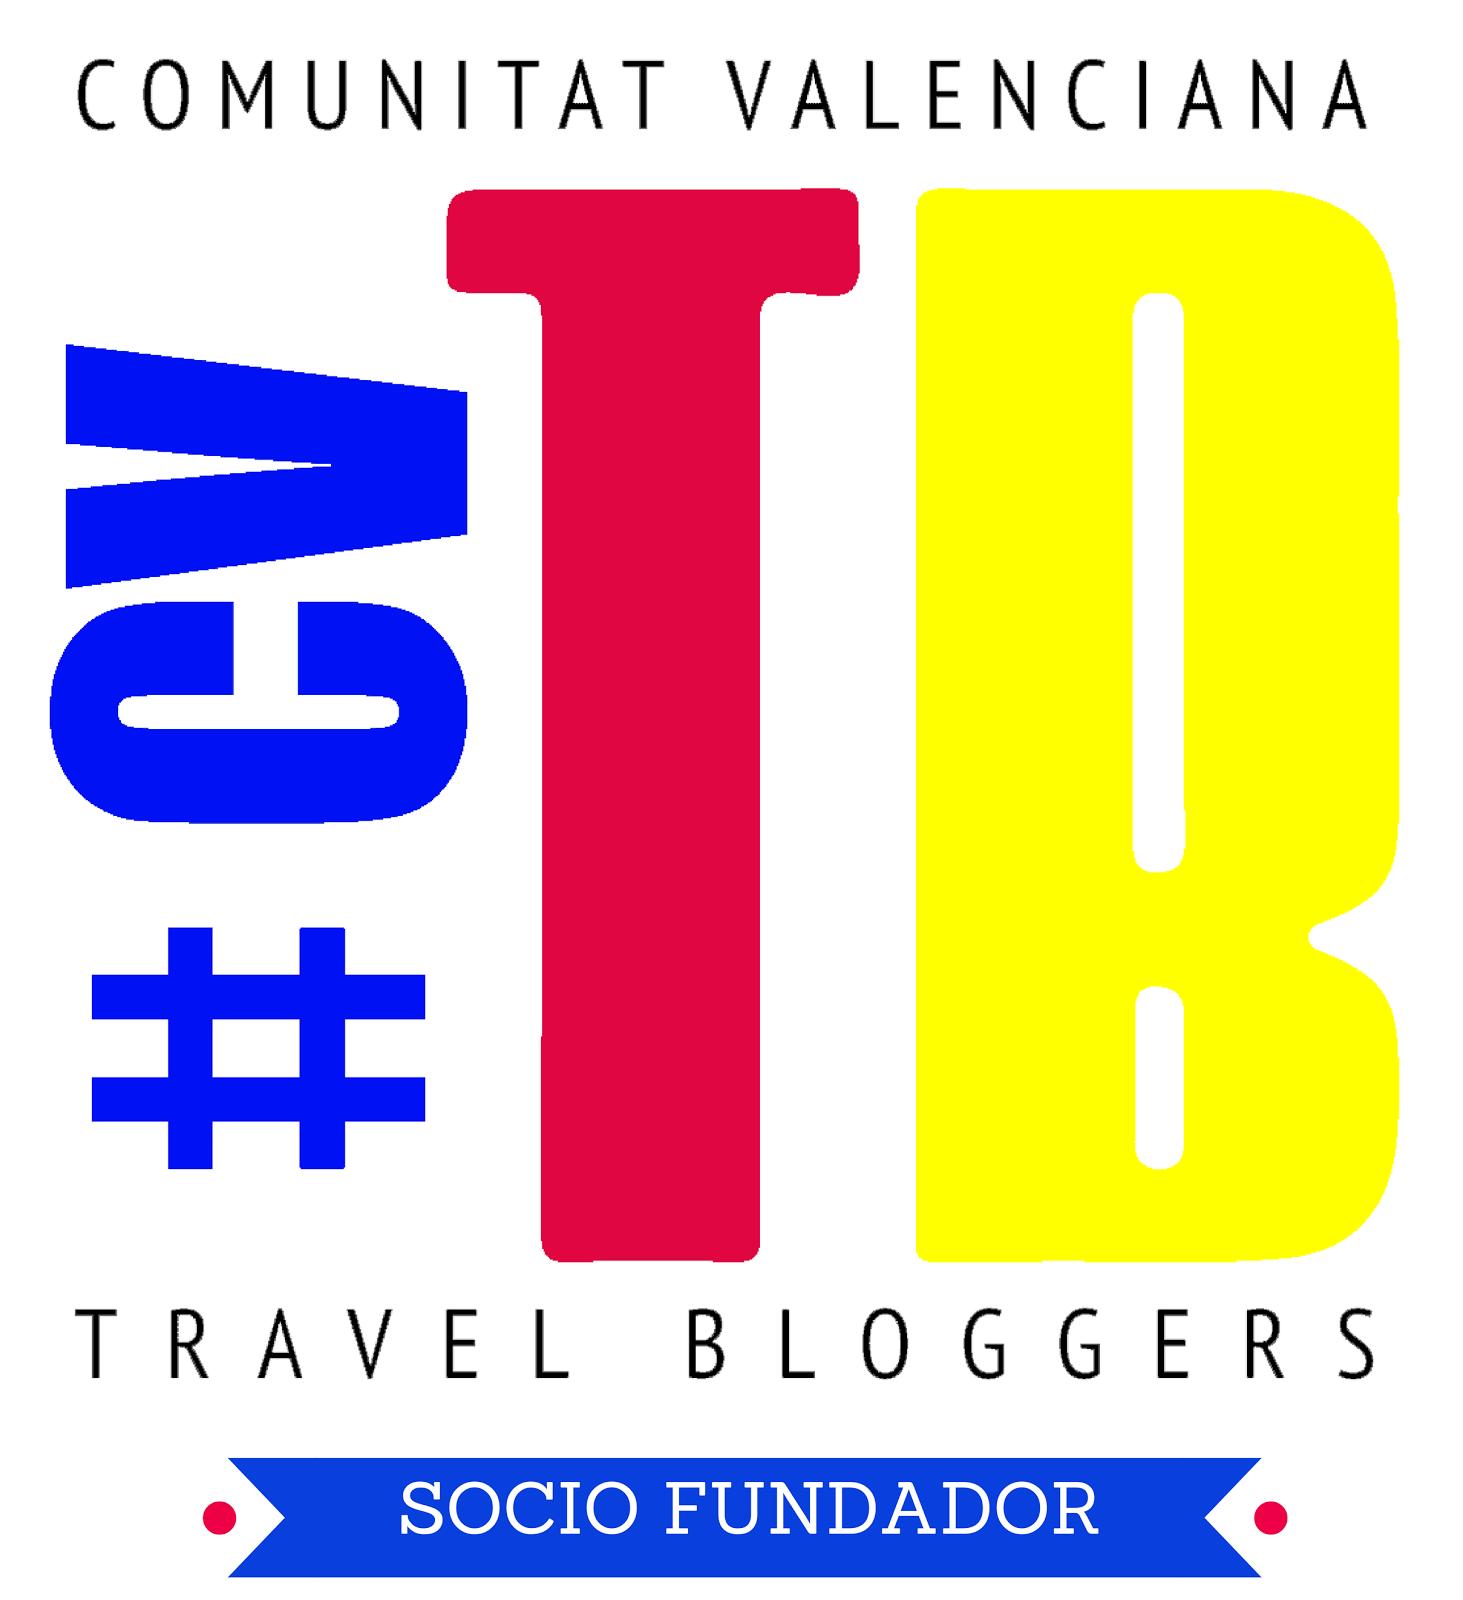 CV Travel Bloggers